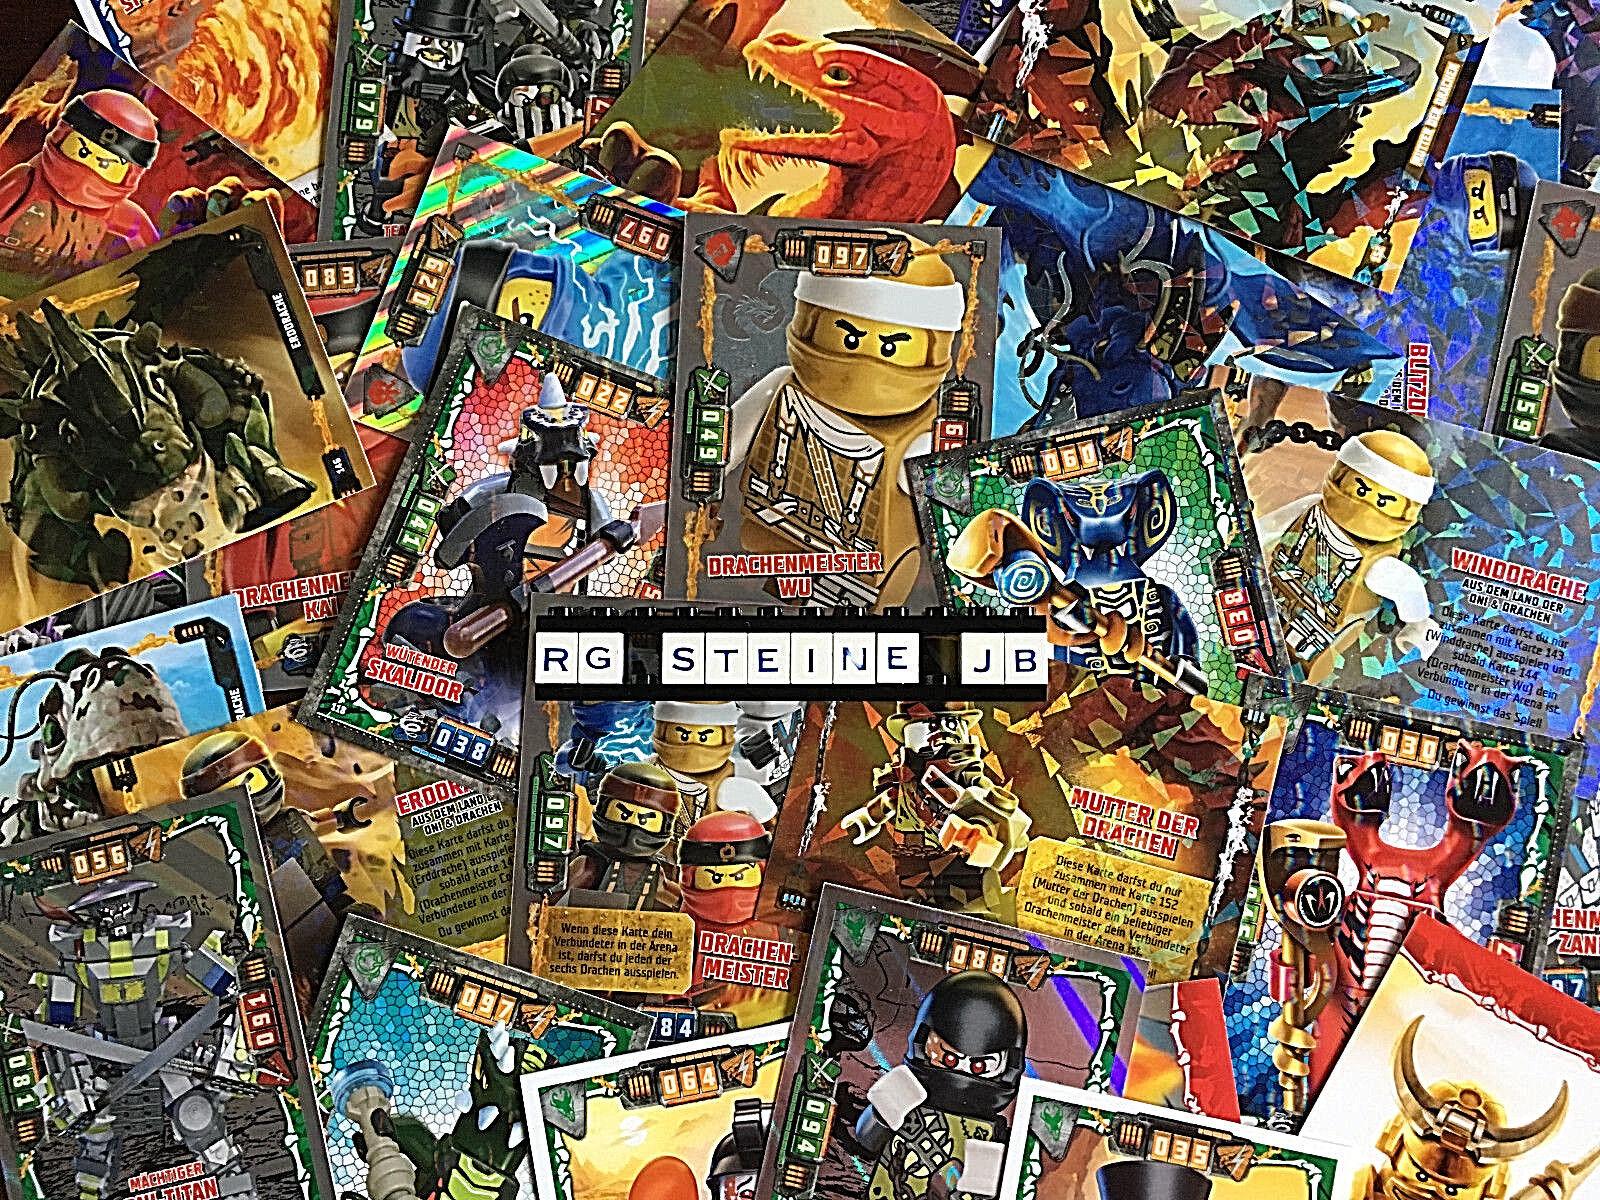 Lego Ninjago Serie 4 Trading Card Game aus allen 252 Sammelkarten aussuchen Neu